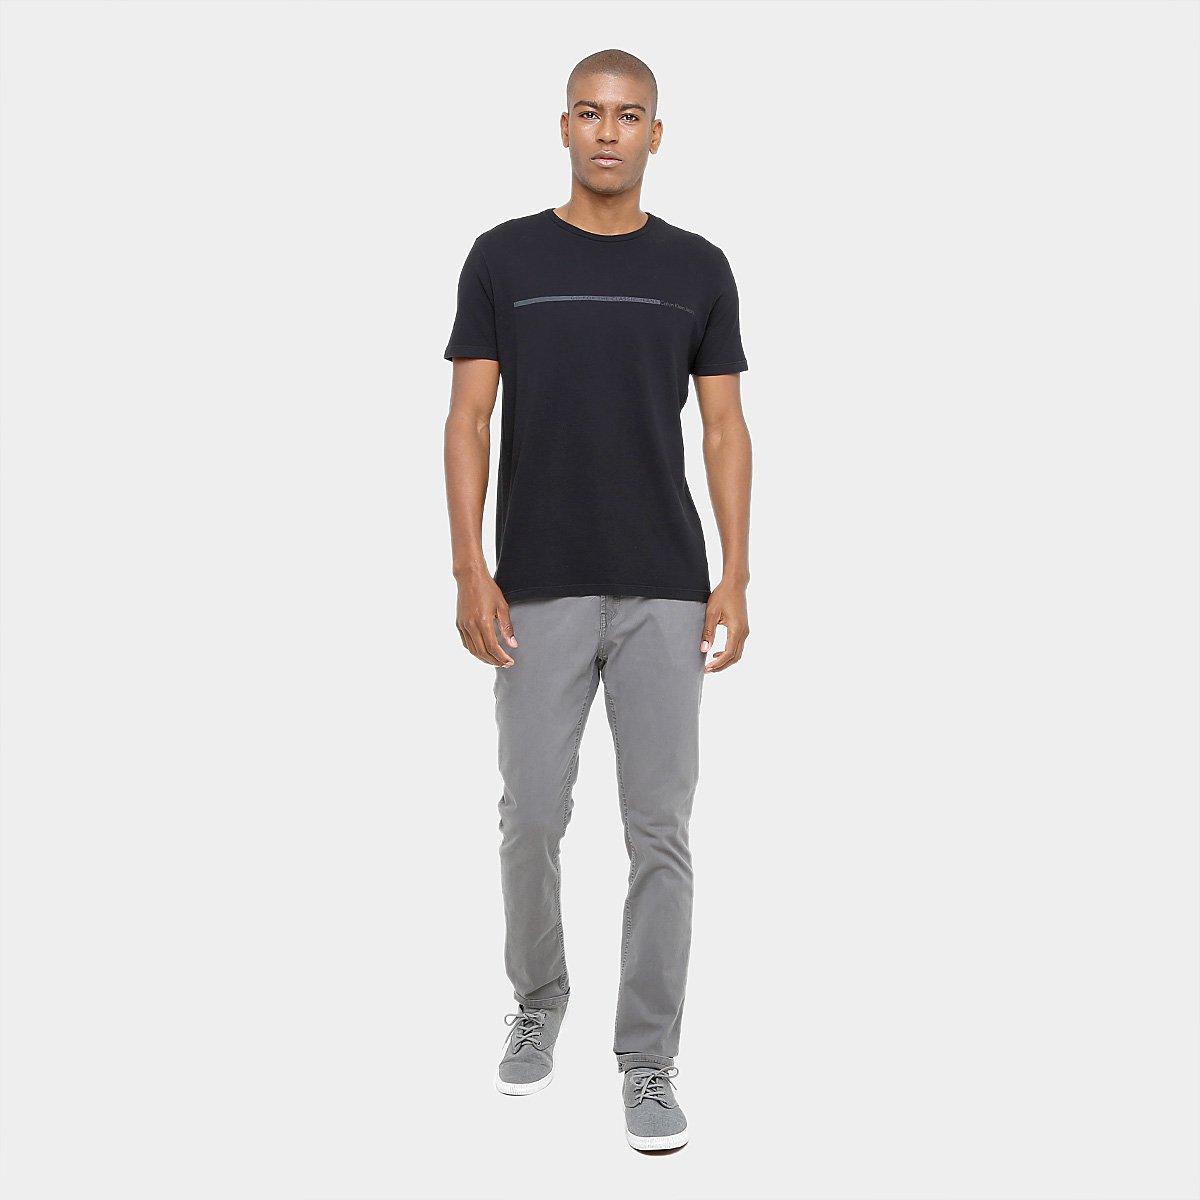 Calça Skinny Calvin Klein Chino Masculino - Compre Agora  39d67abebb5b2